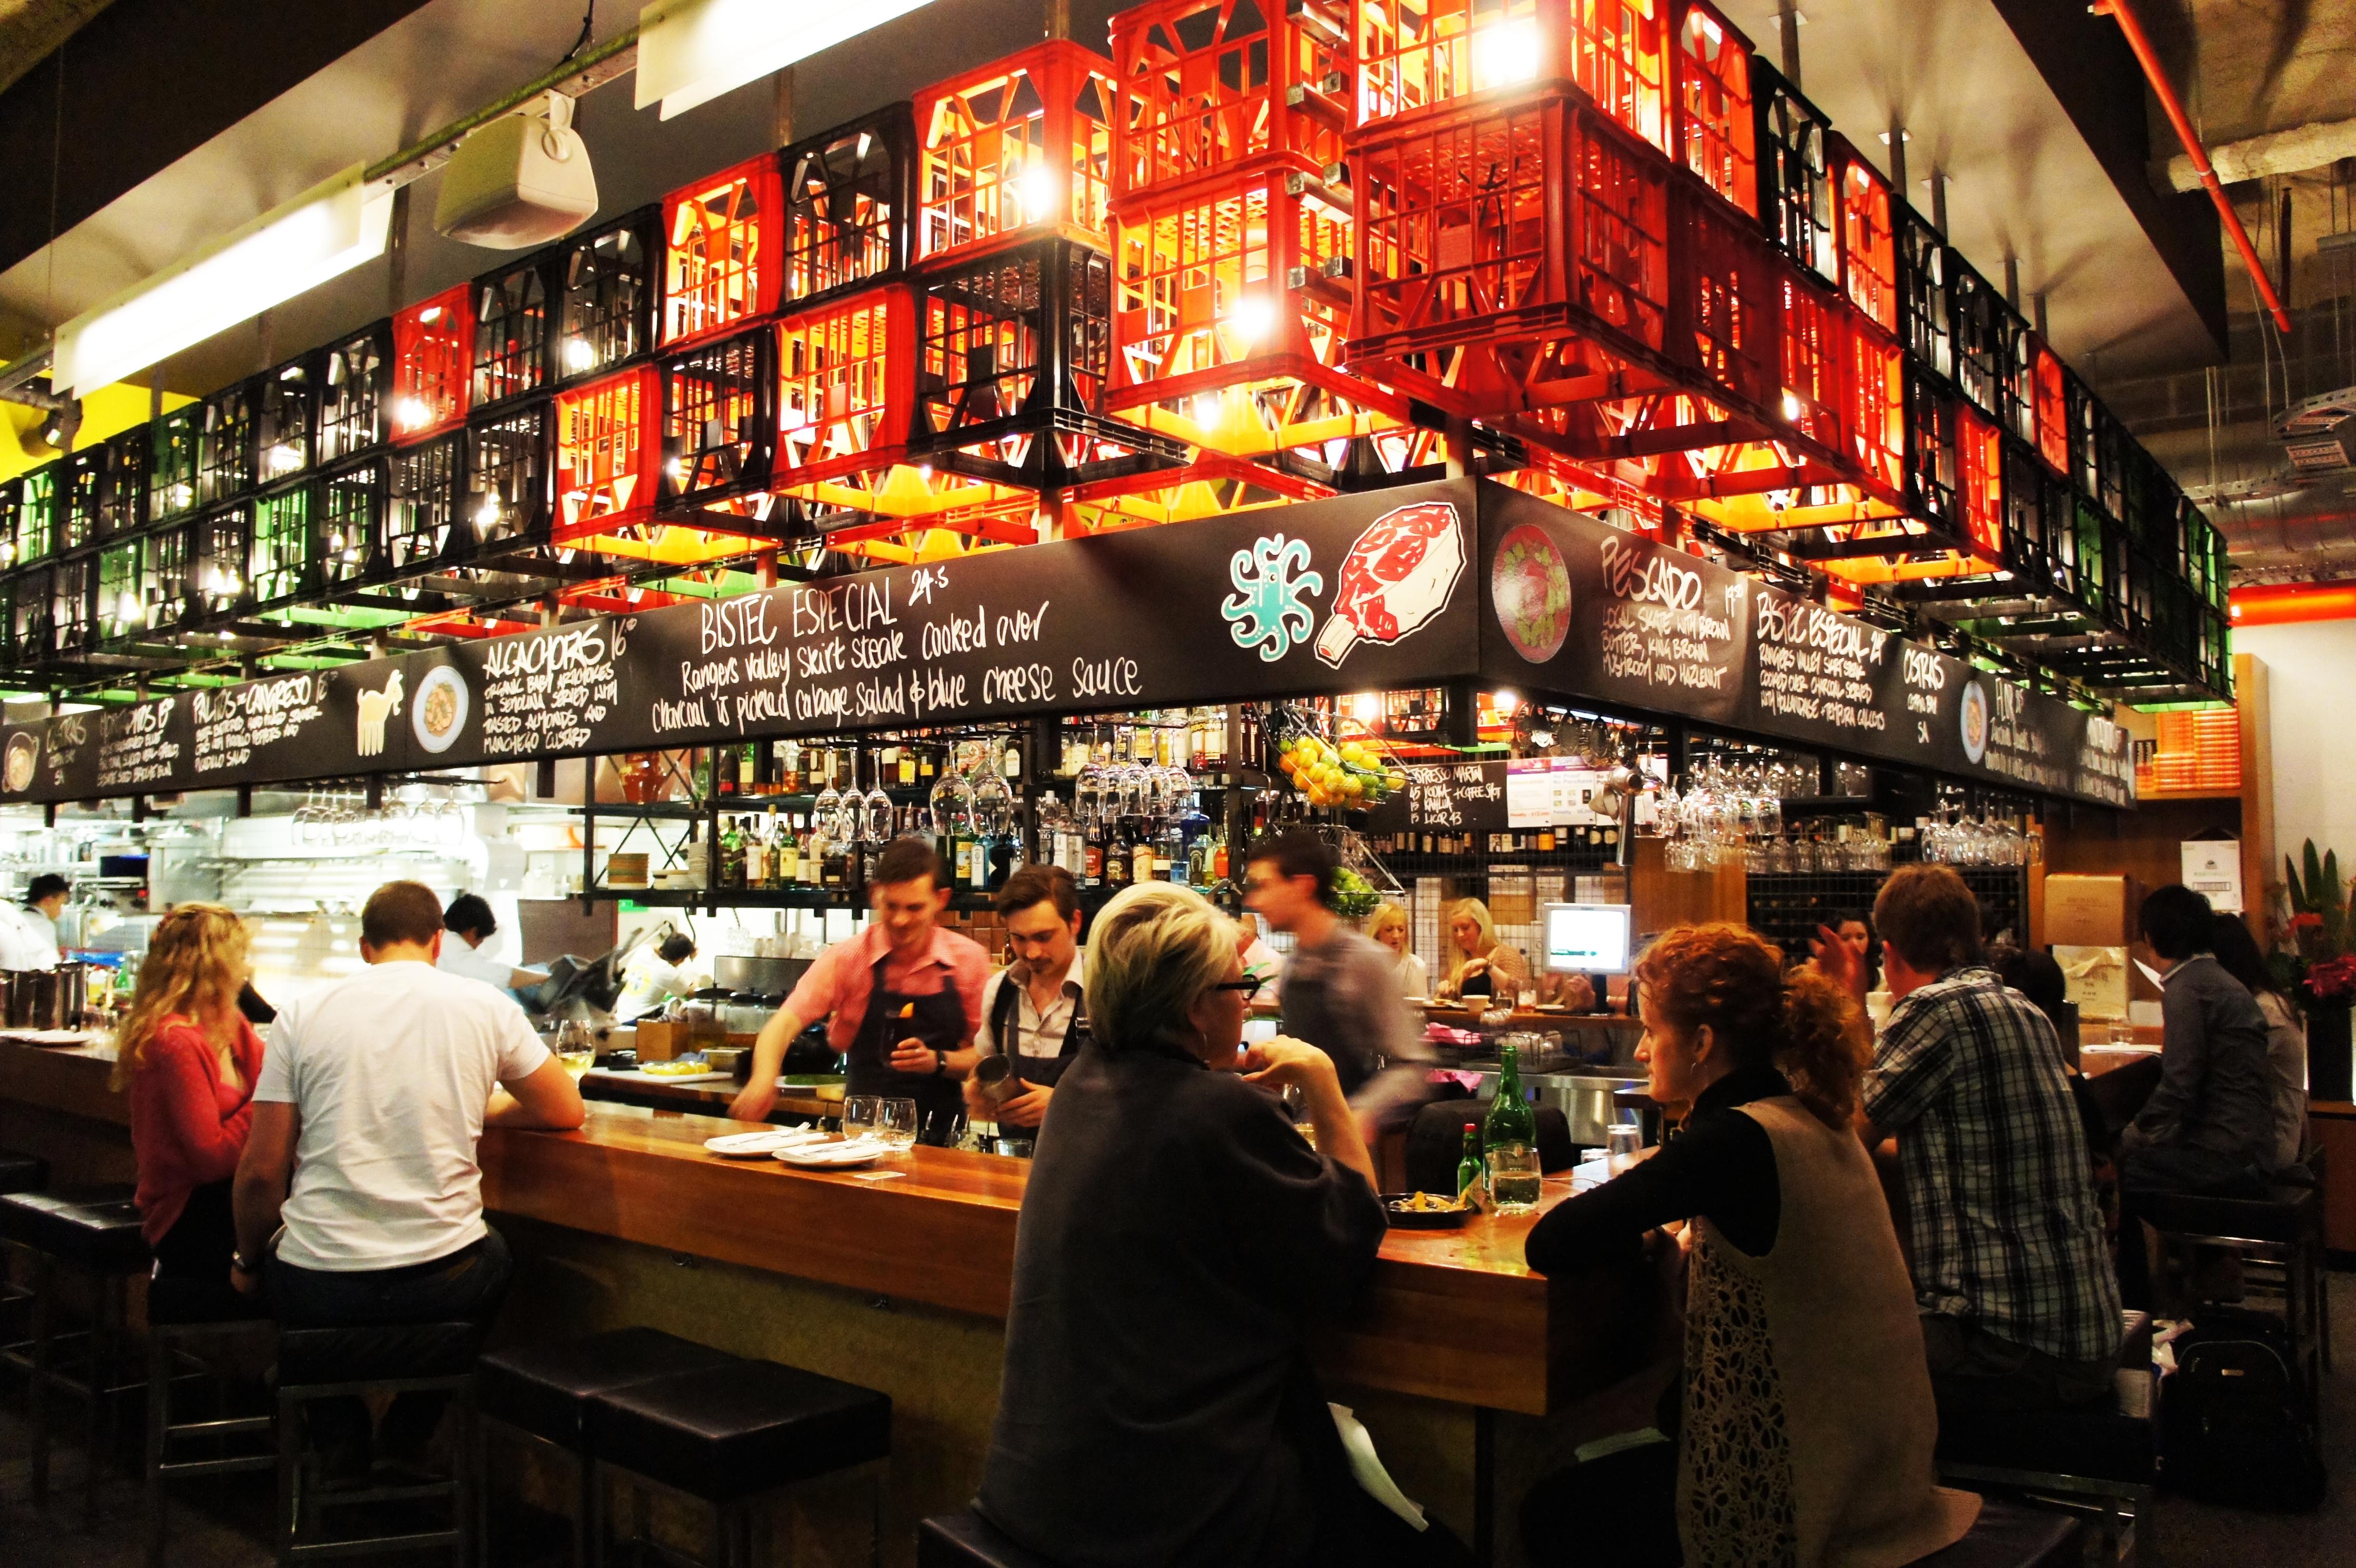 Fill Restaurant And Bar